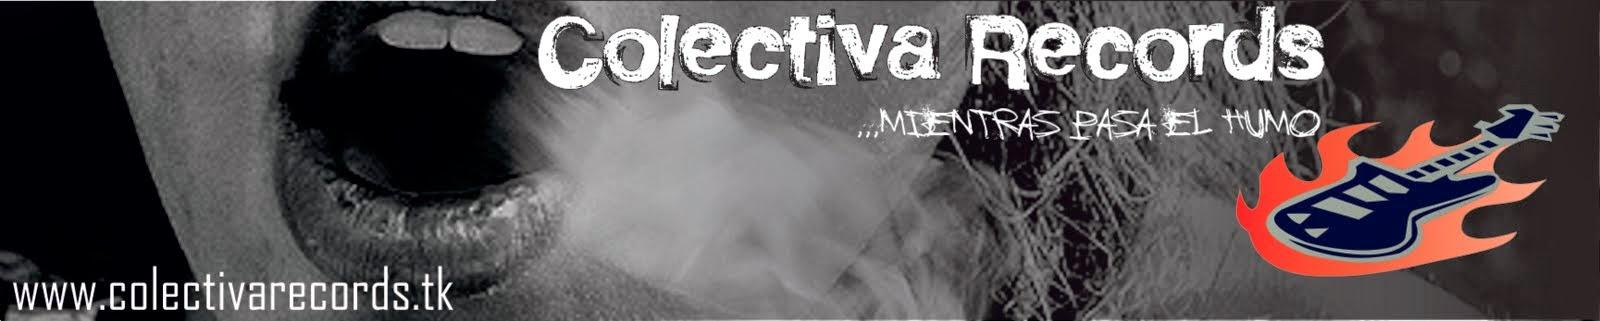 COLECTIVA RECORDS